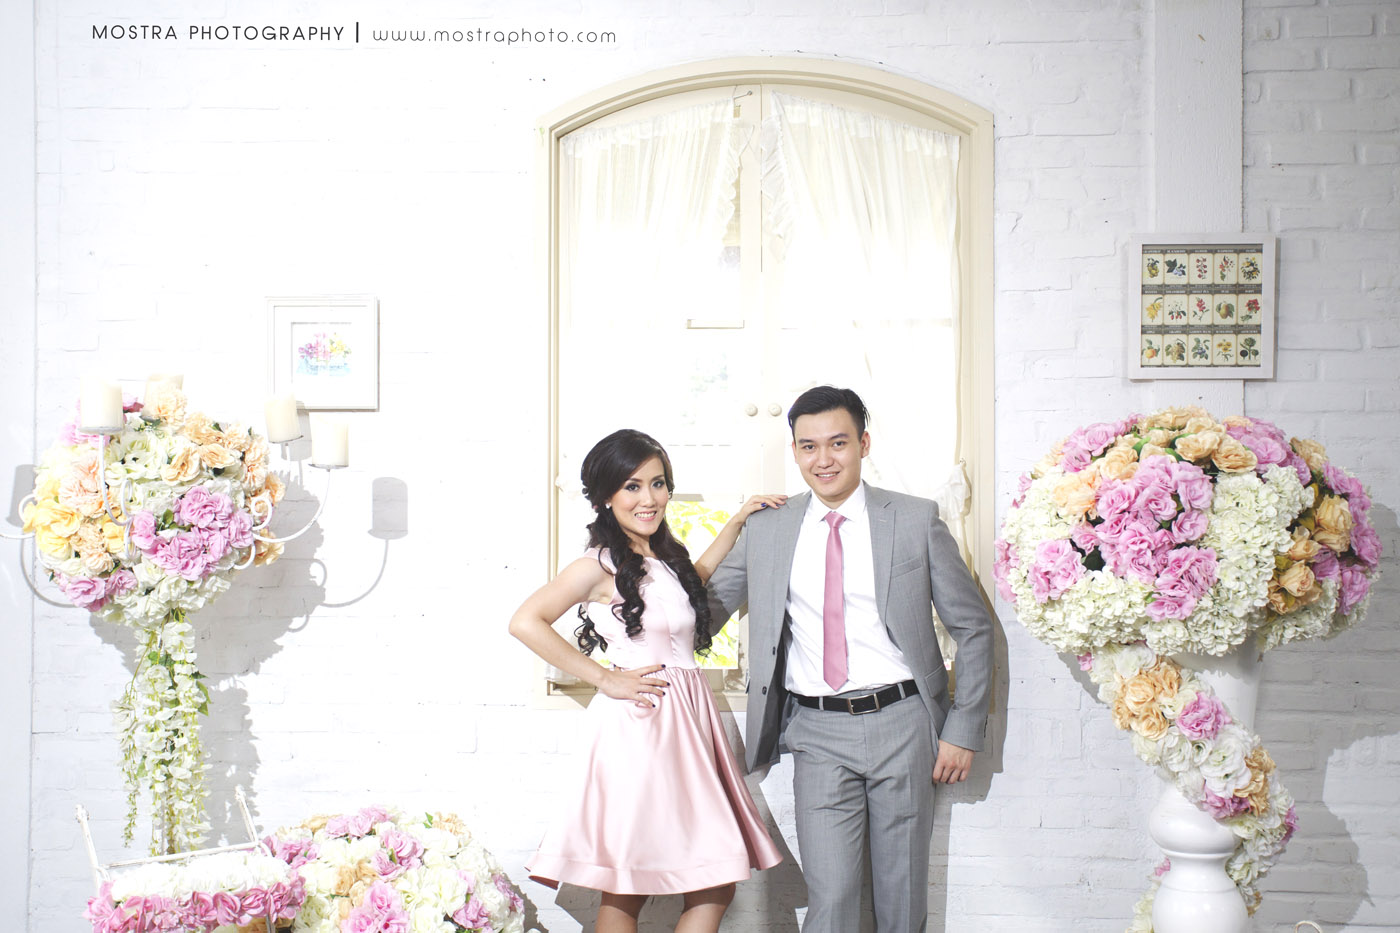 Mostra Photography Wedding Photography In Bandung Bridestory Com